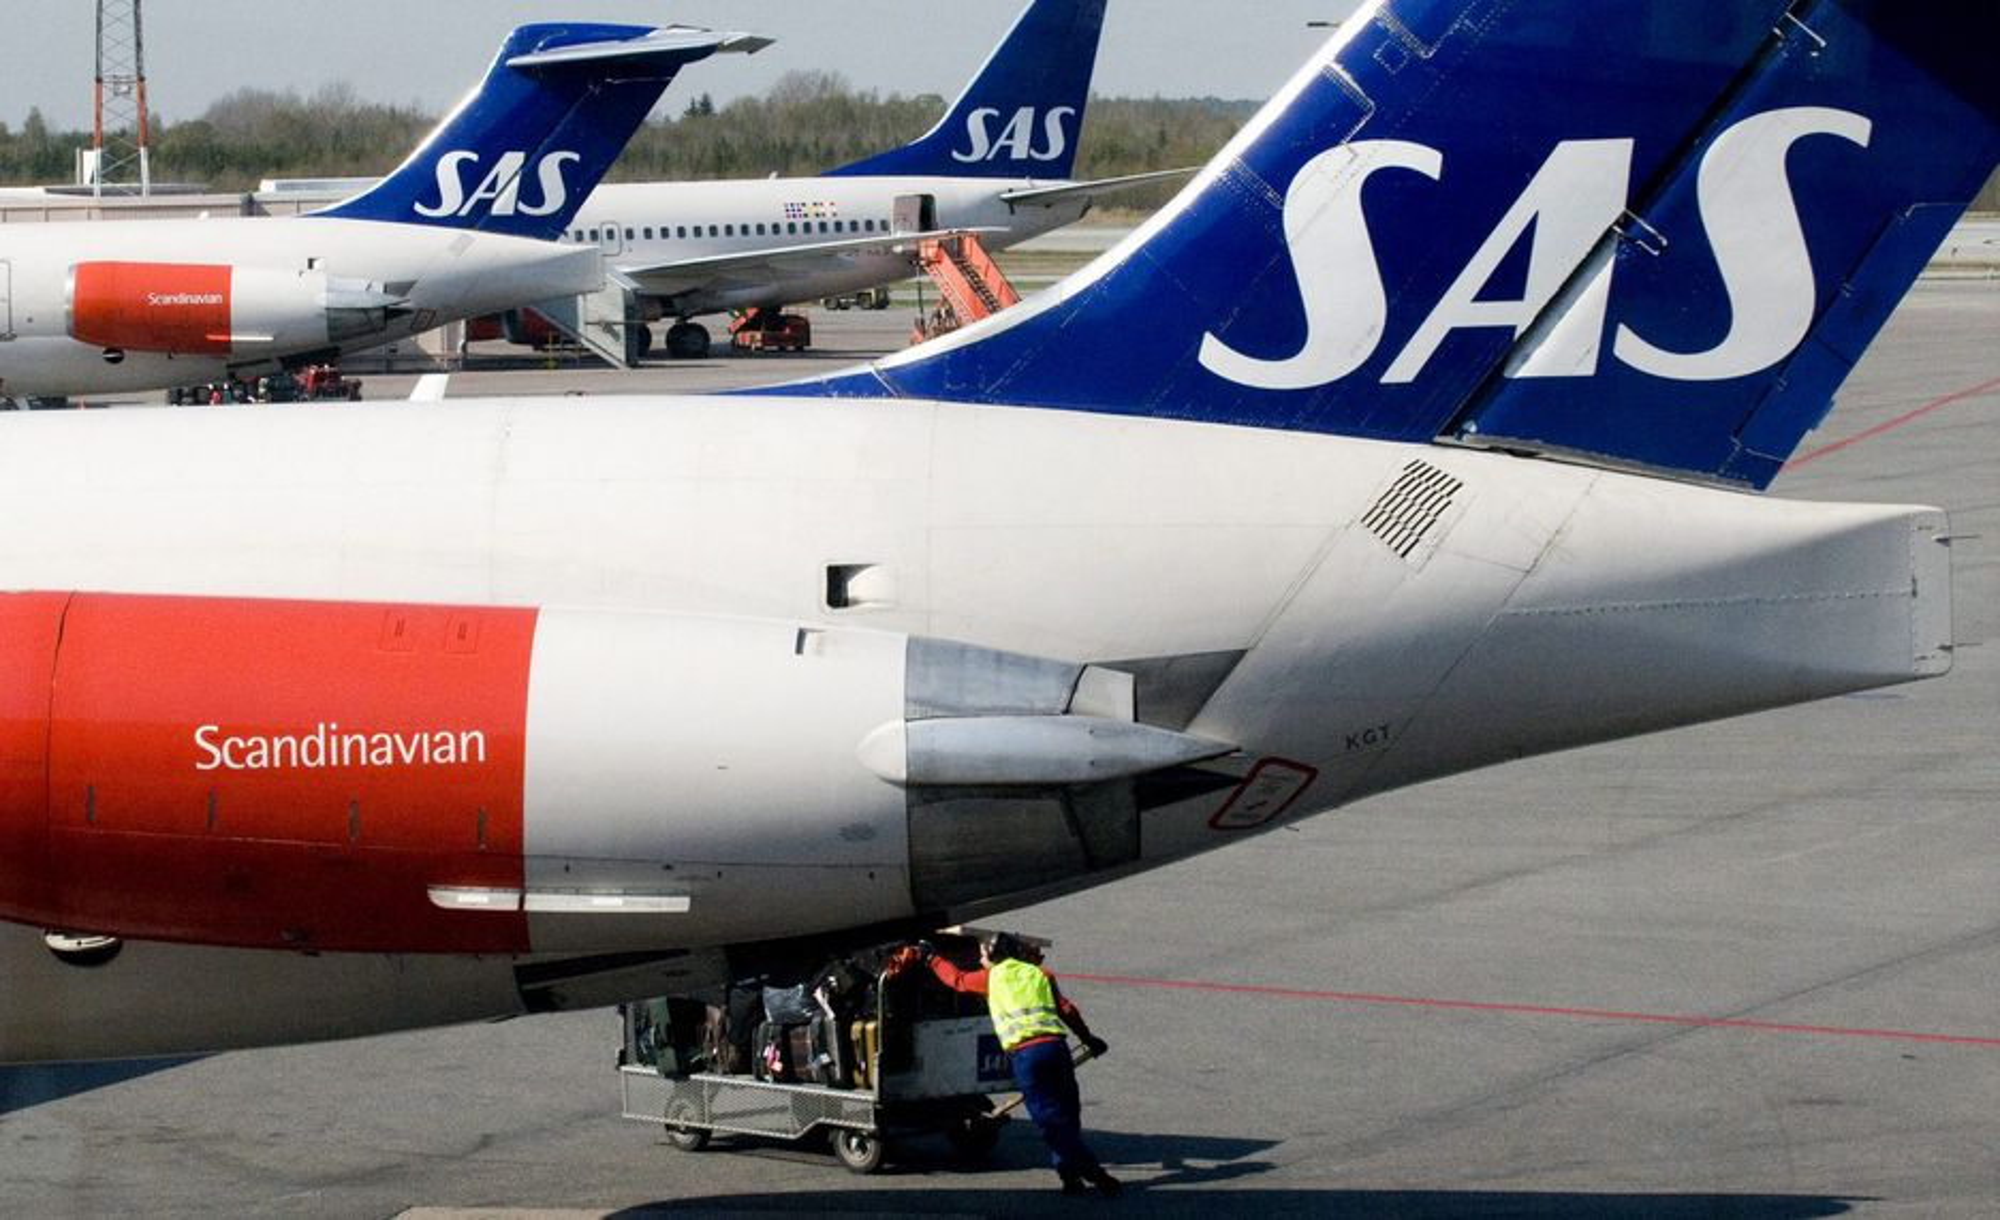 STRID: Bør SAS få Norges penger?